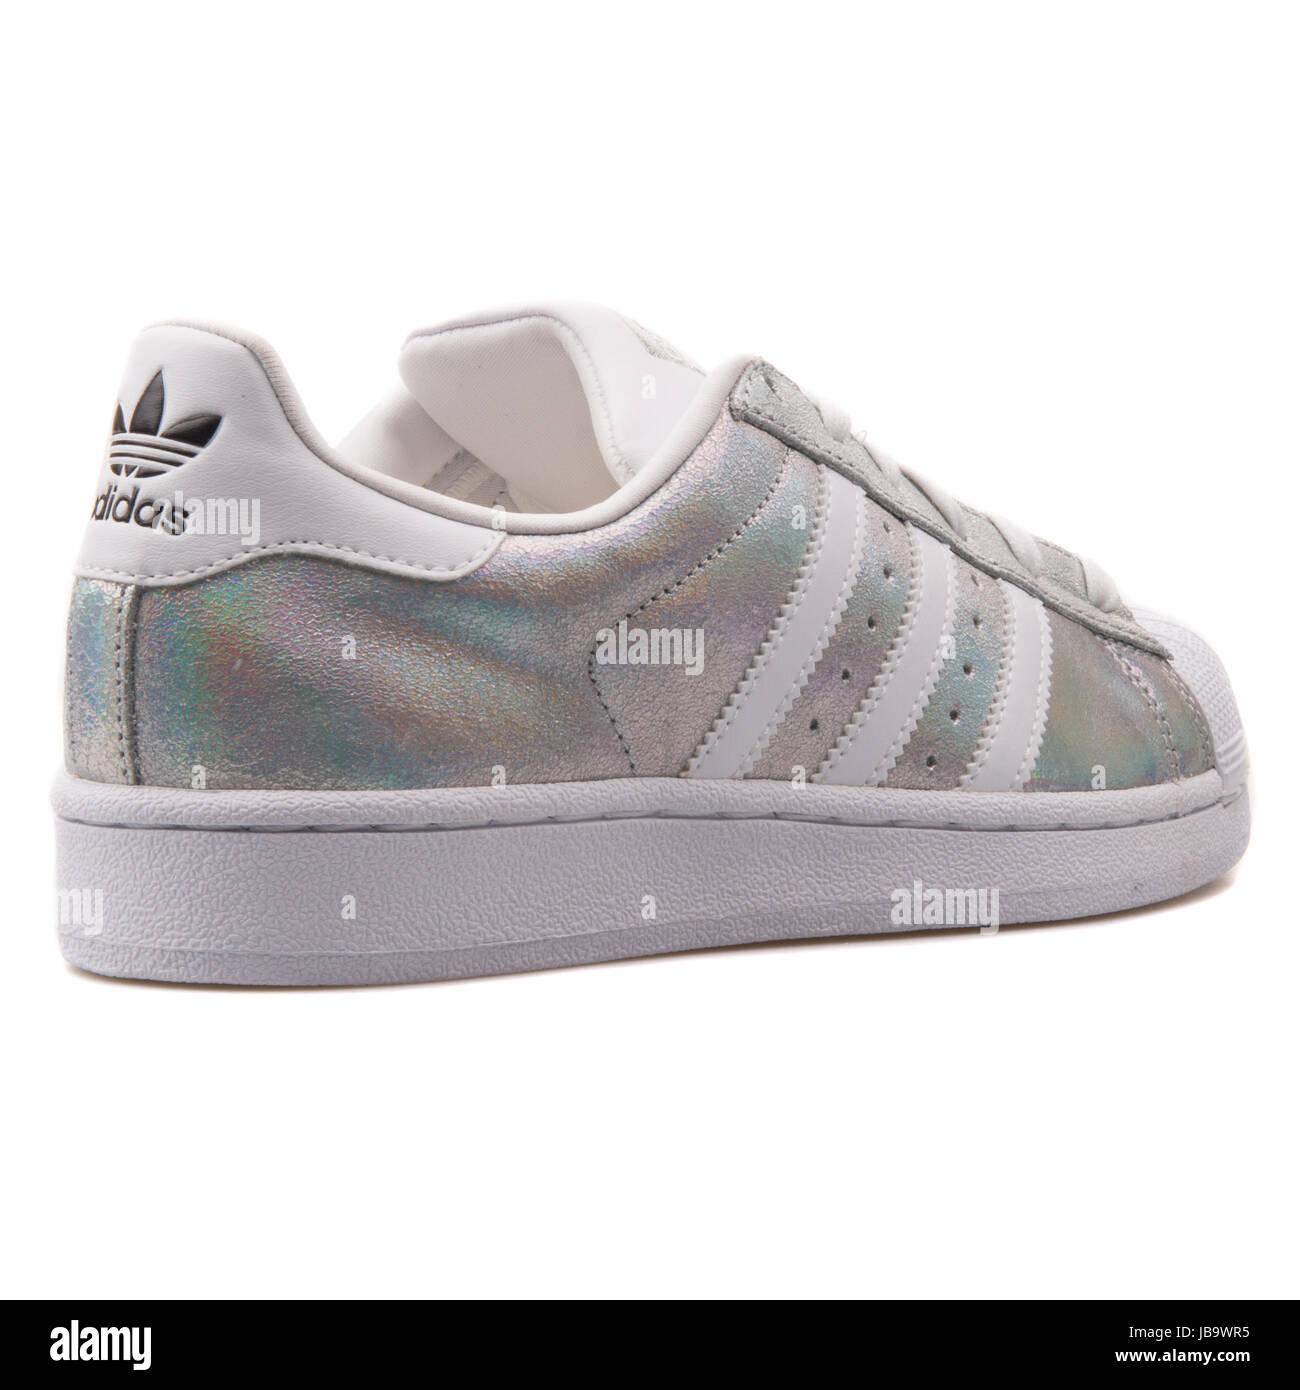 Adidas superstar iridescente scarpe femminili